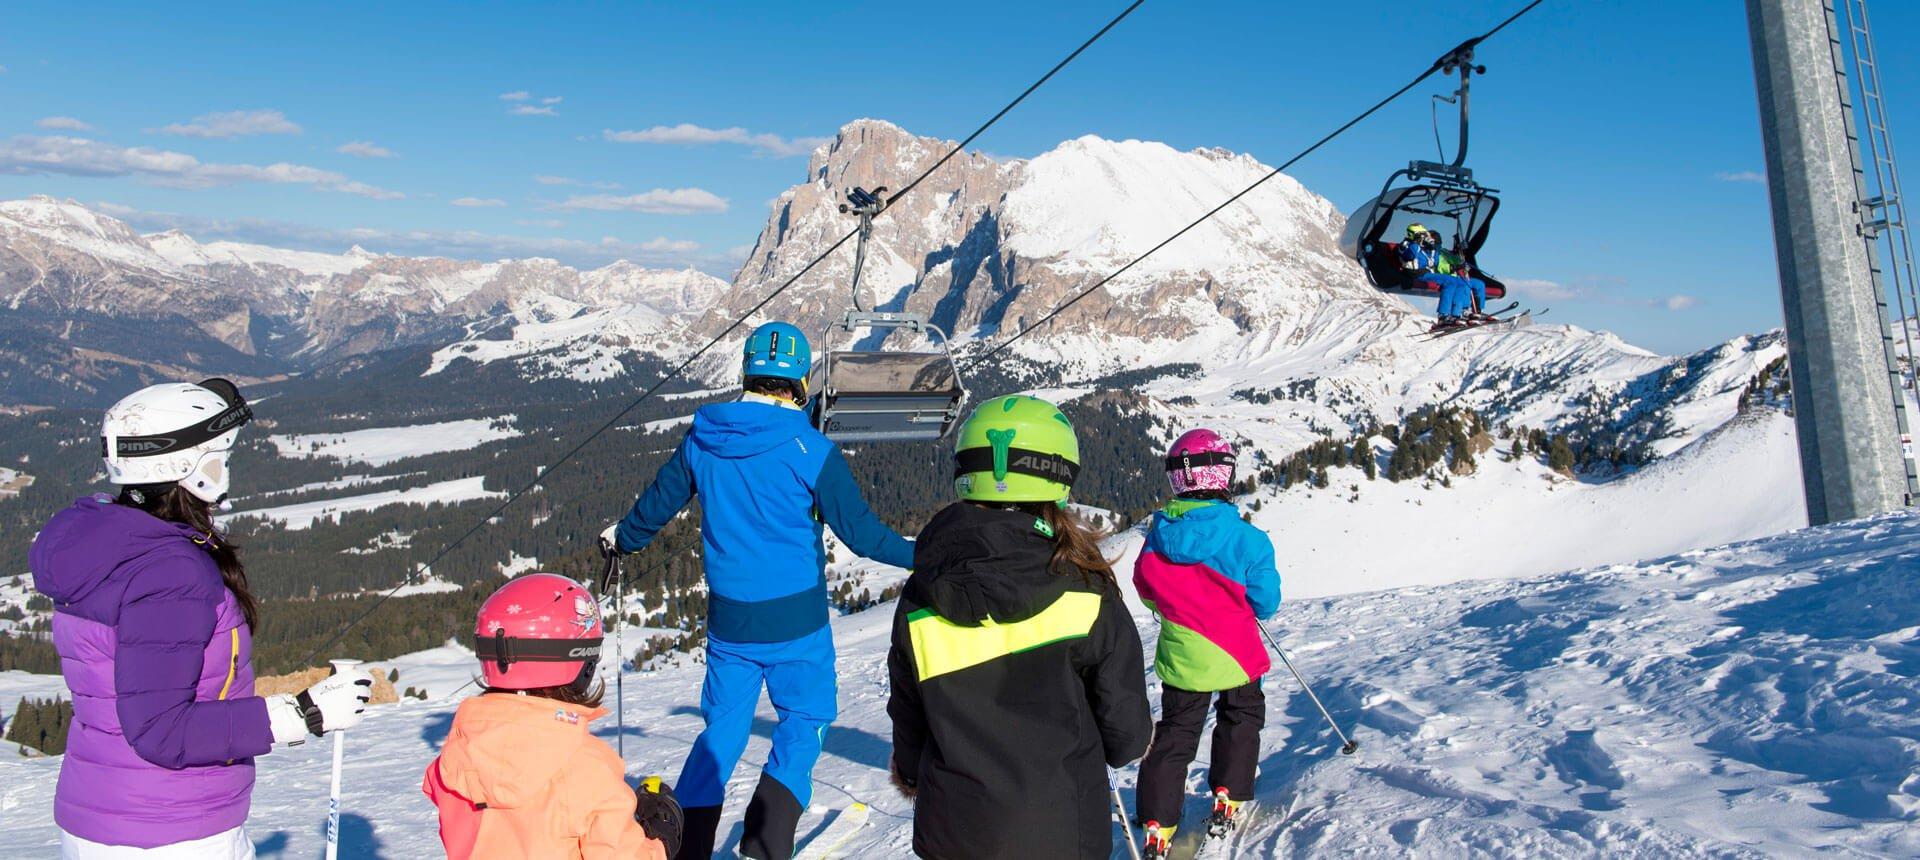 skifahren-seiser-alm